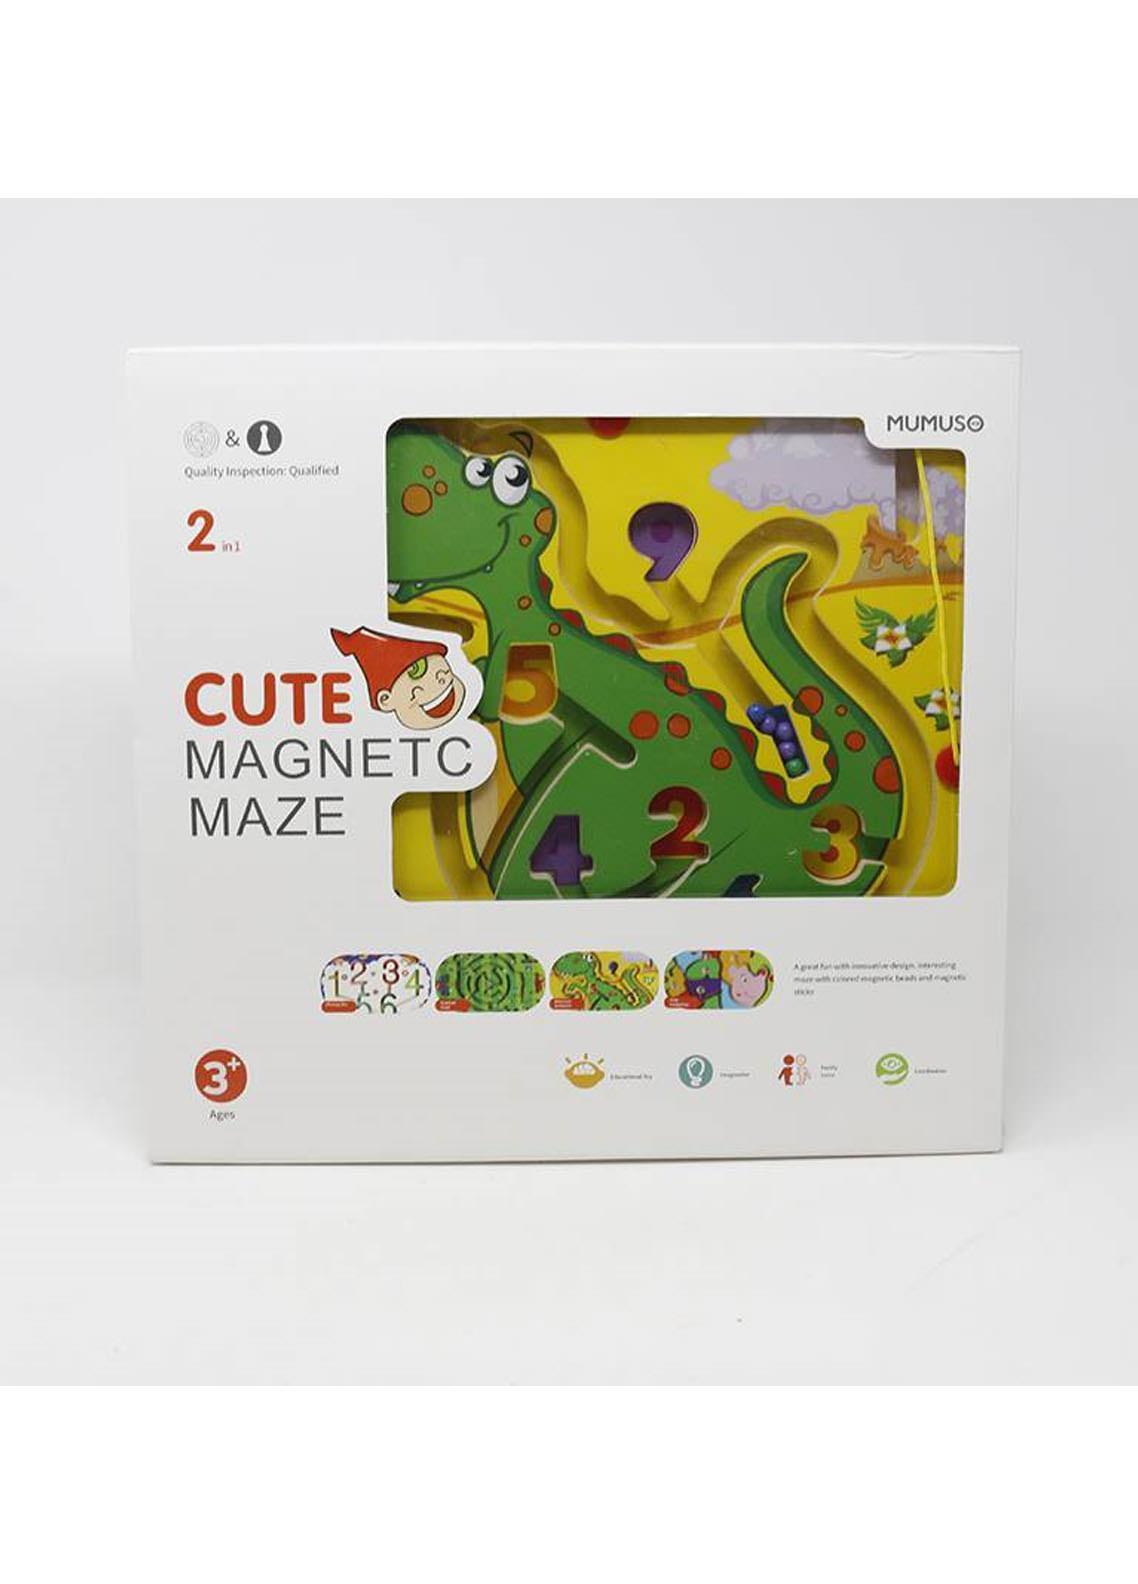 Mumuso CUTE MAGNETIC MAZE